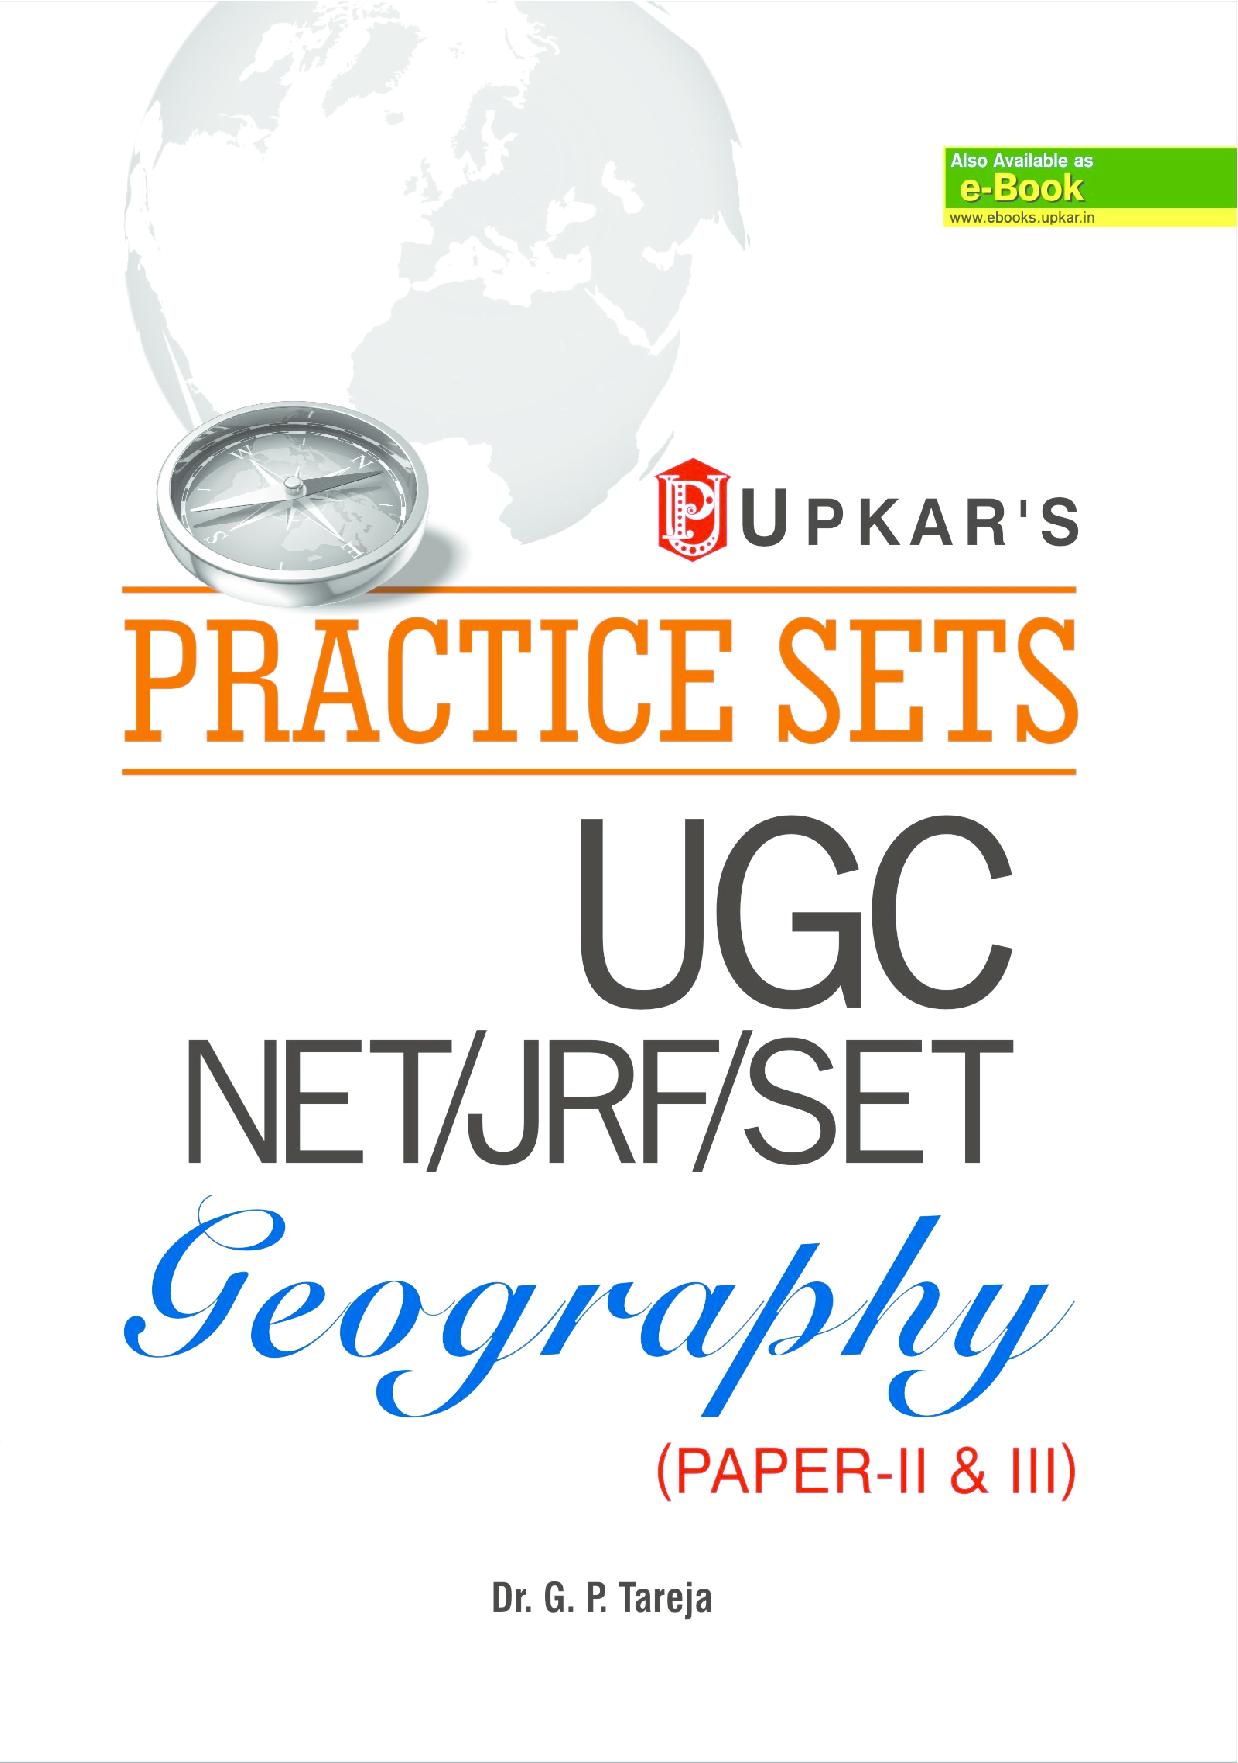 Practice Sets UGC NET/JRF/SET Geography Paper- II & III  - Page 1